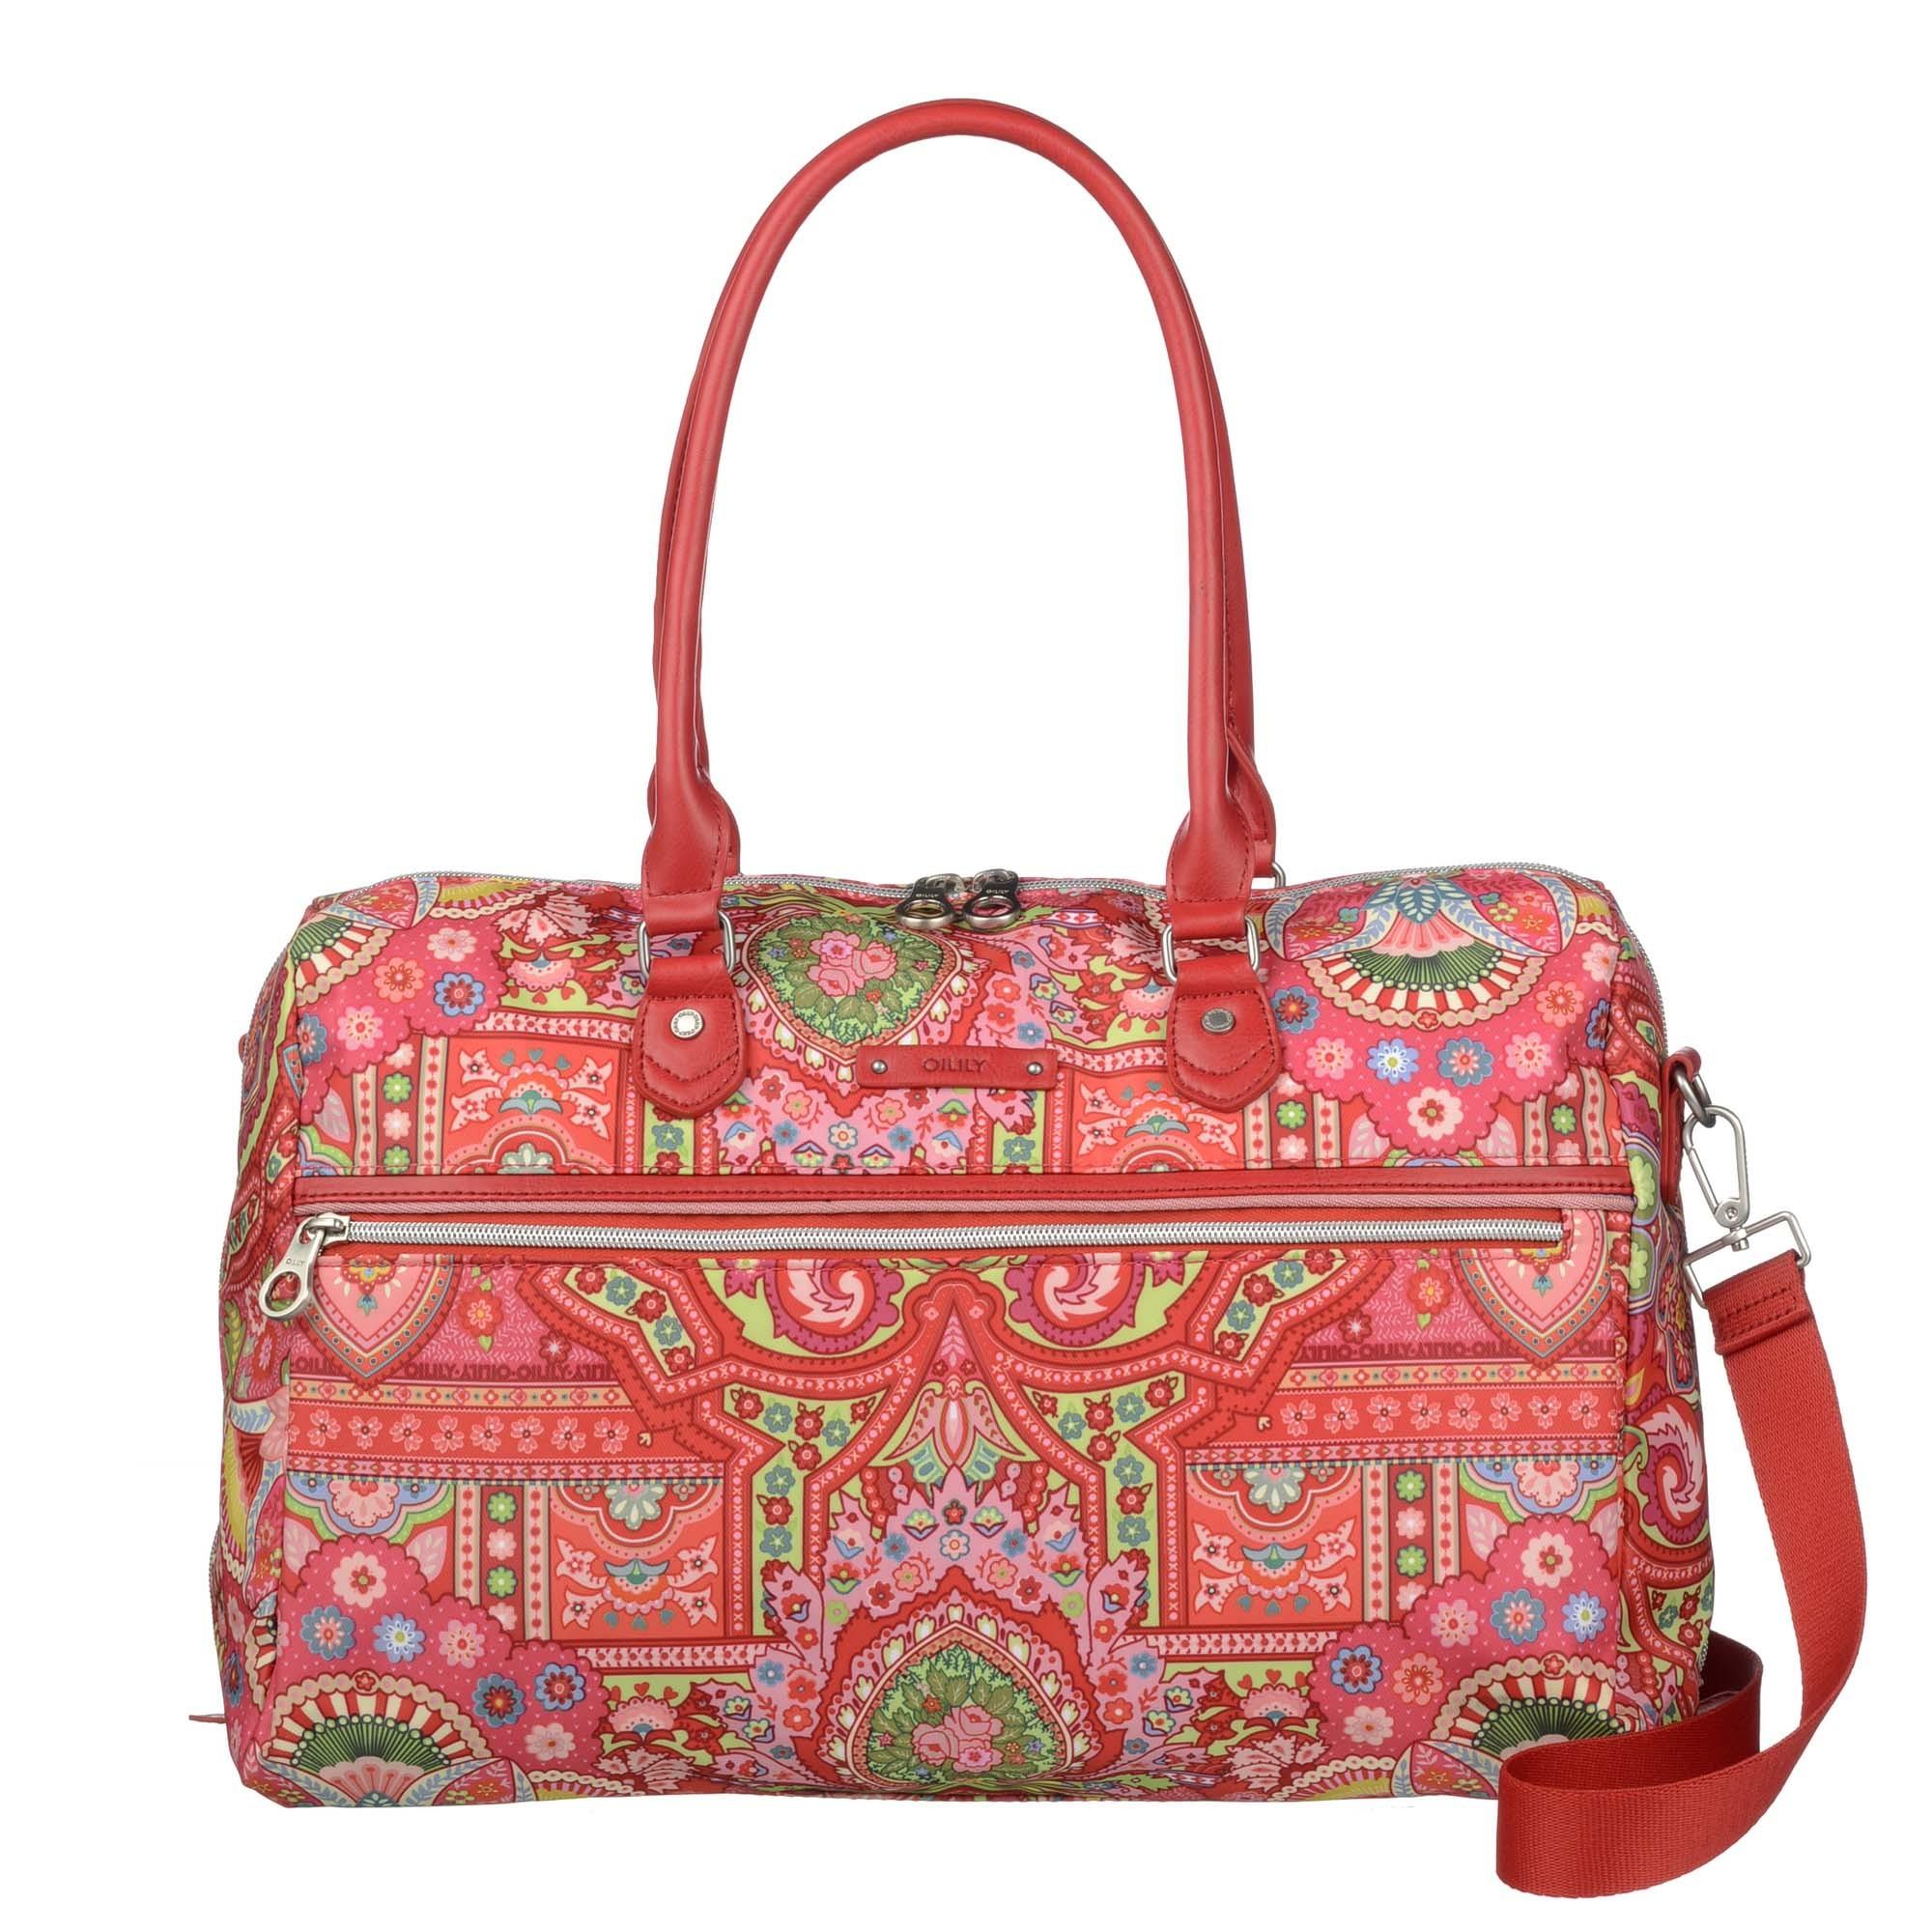 Oilily Boston Bag Handbag Spring Ovation In 4 Colours